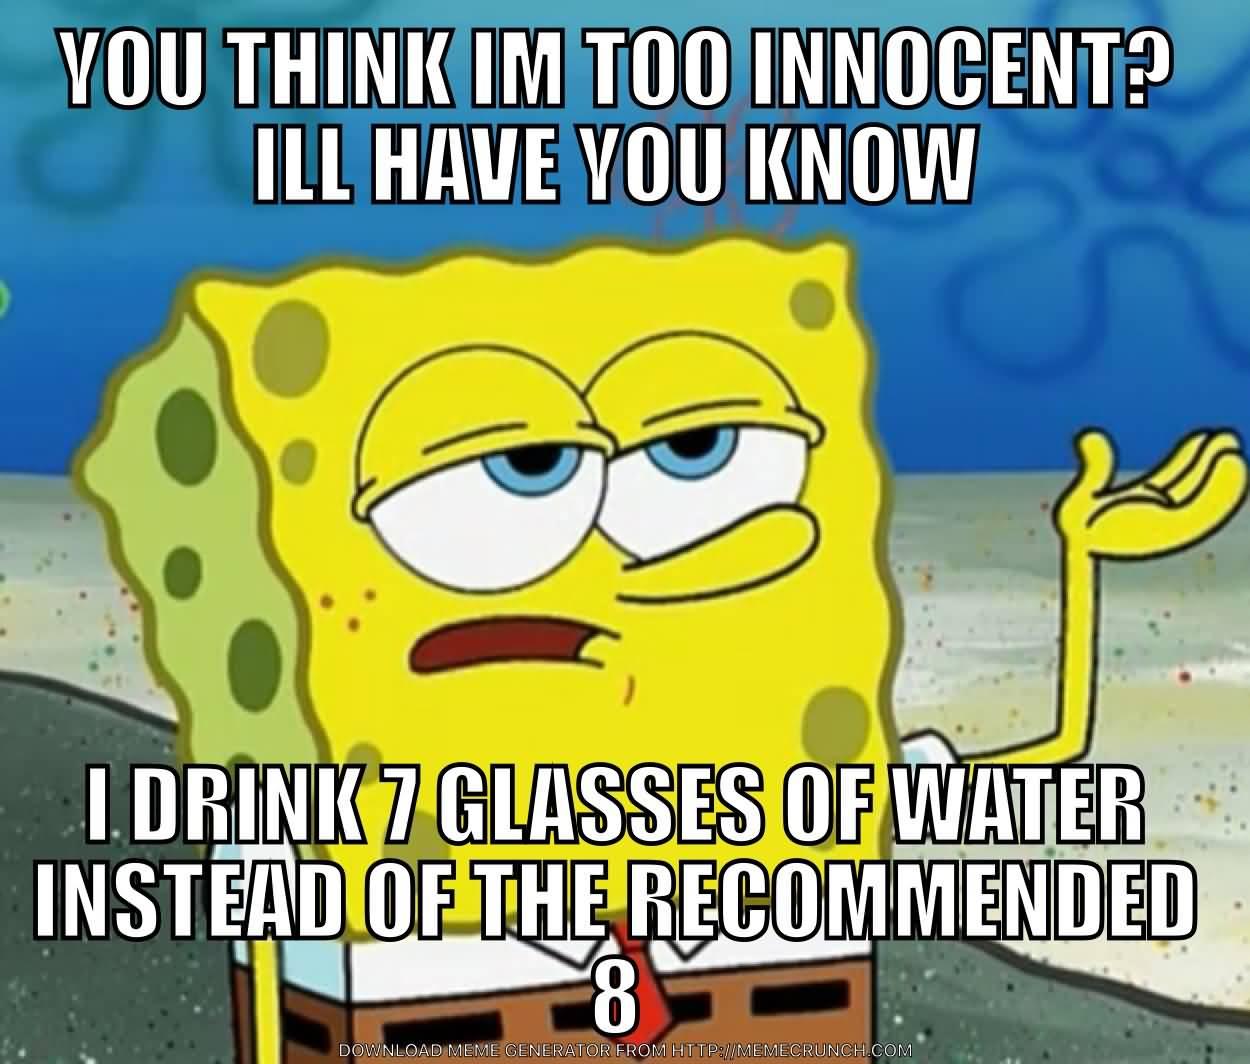 Savage Spongebob Meme Image Photo Joke 15